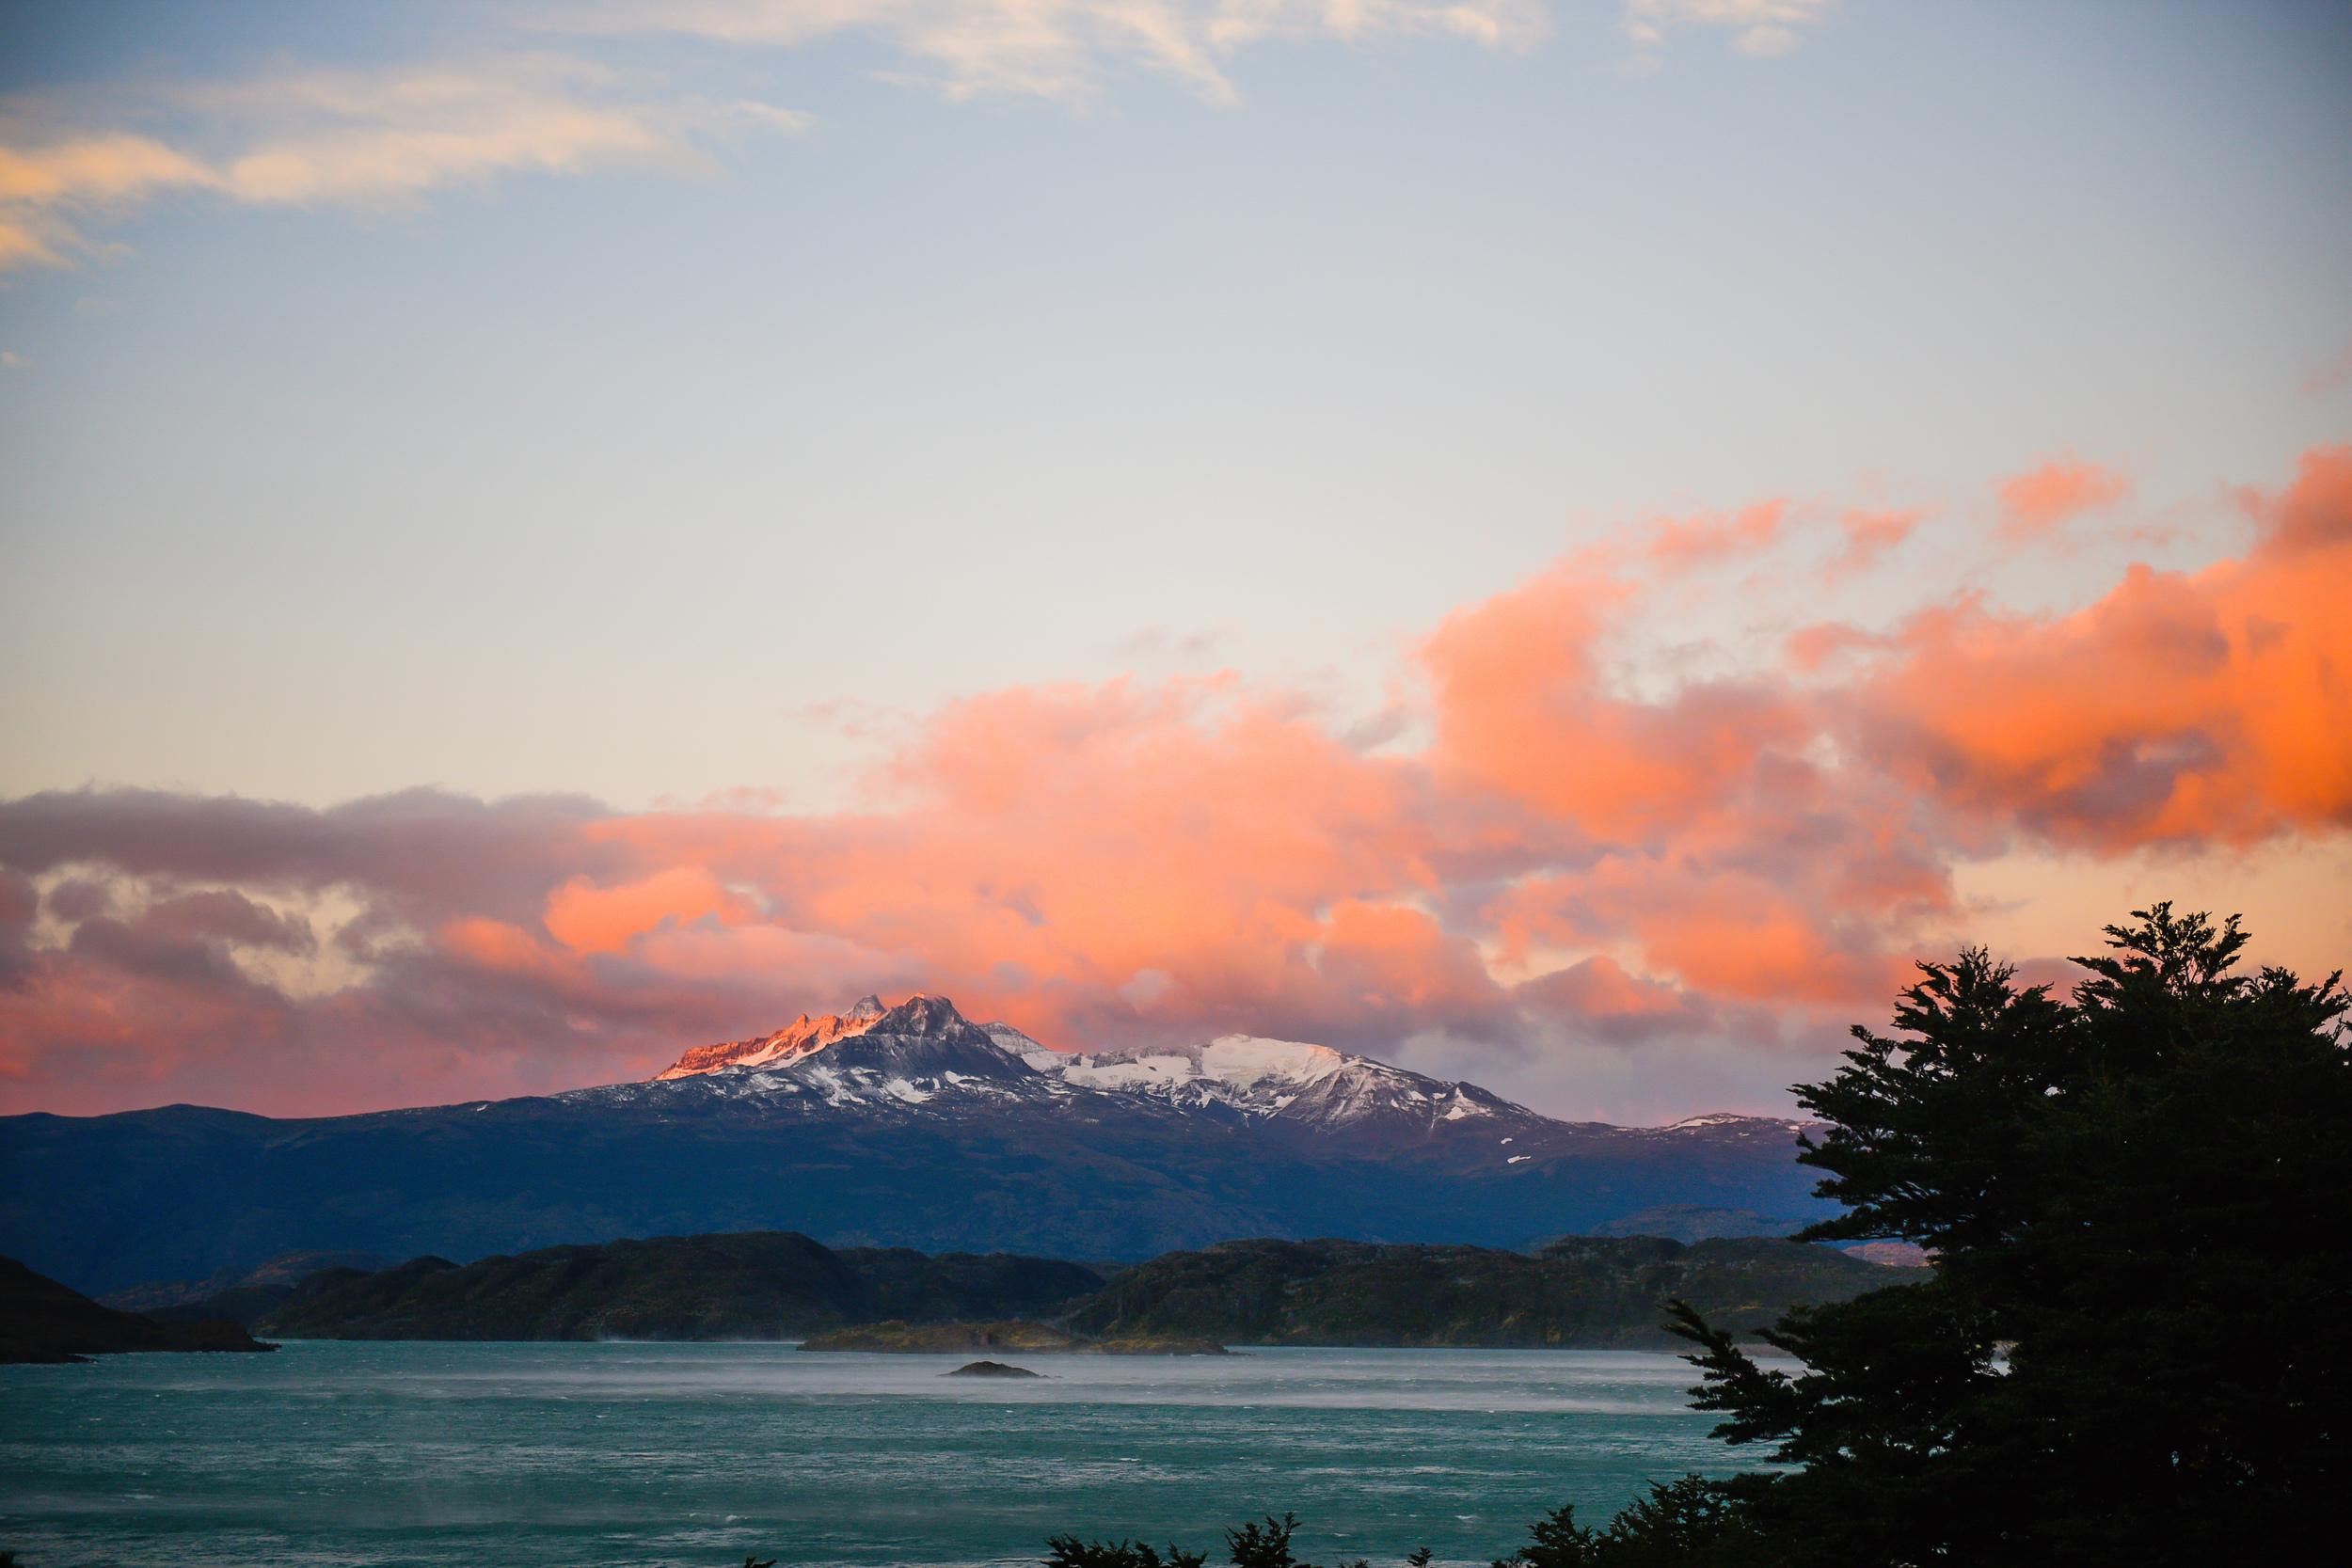 patagonia-9_26594487681_o.jpg